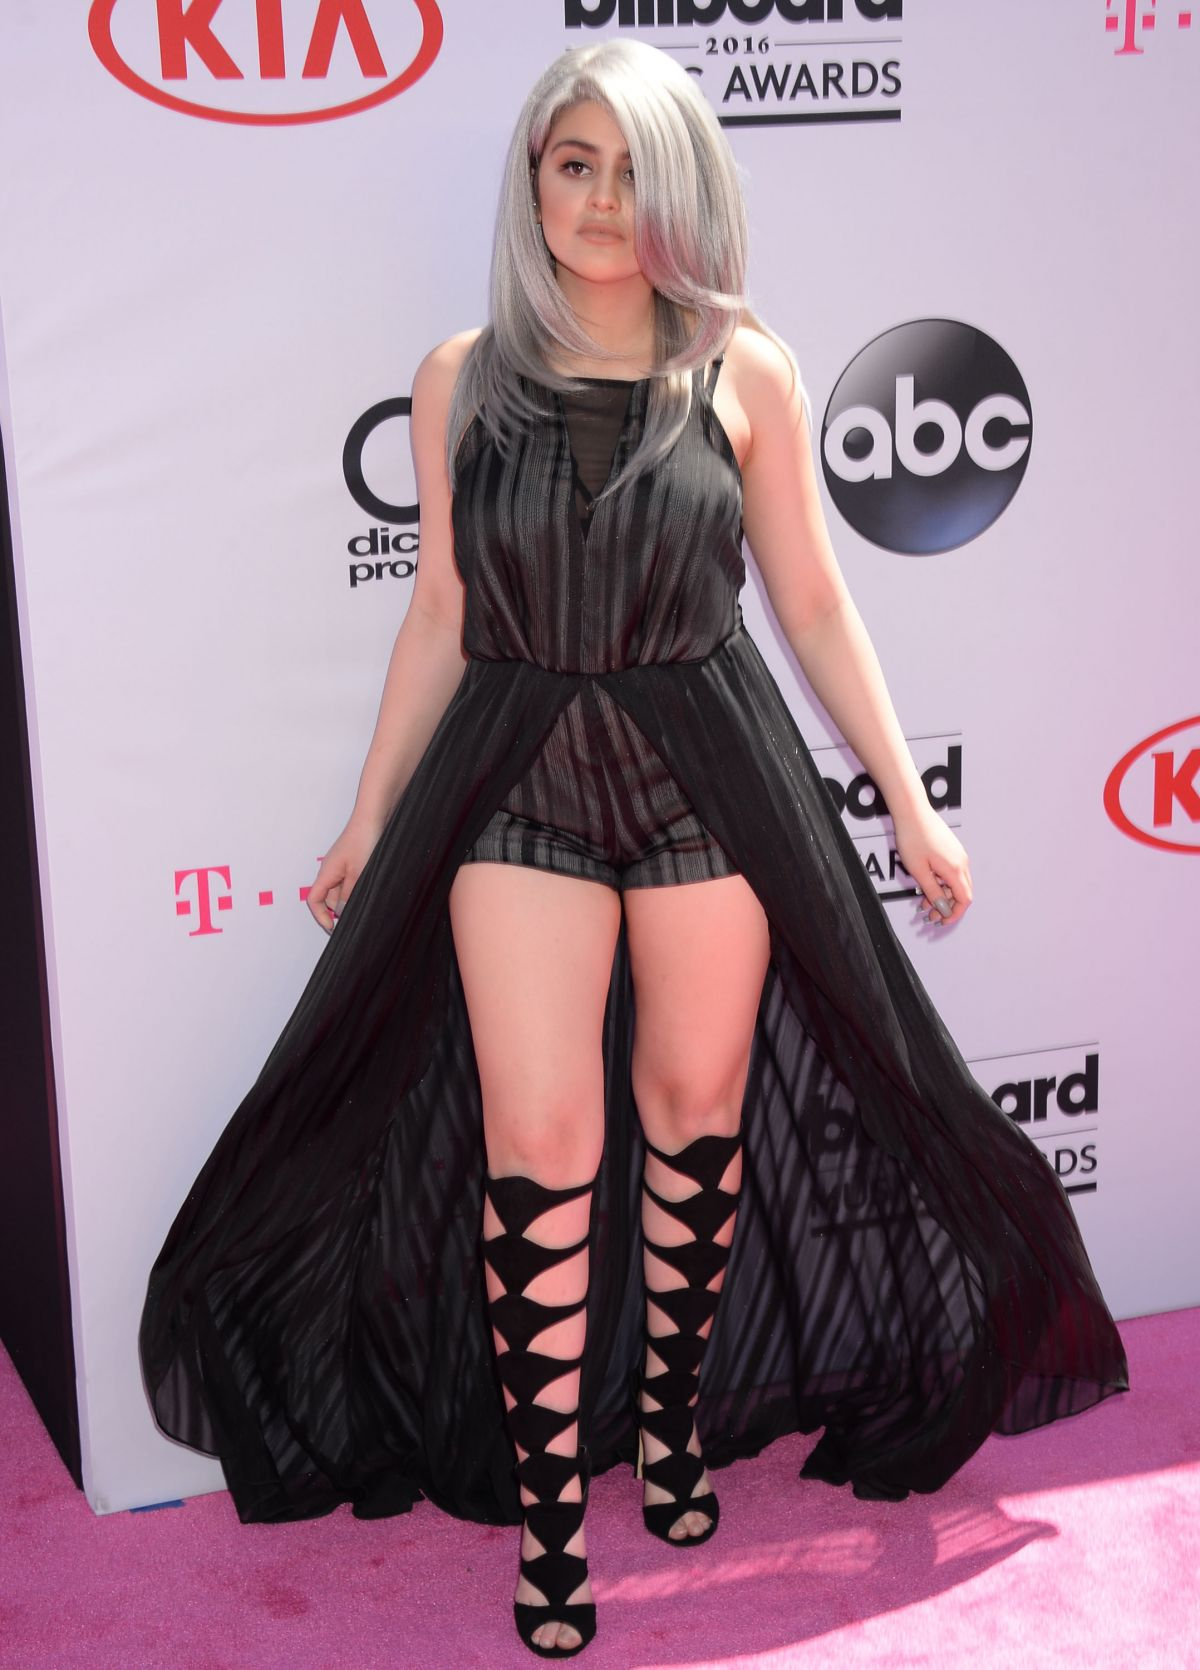 LAUREN GIRALDO at 2016 Billboard Music Awards in Las Vegas 05/22/2016